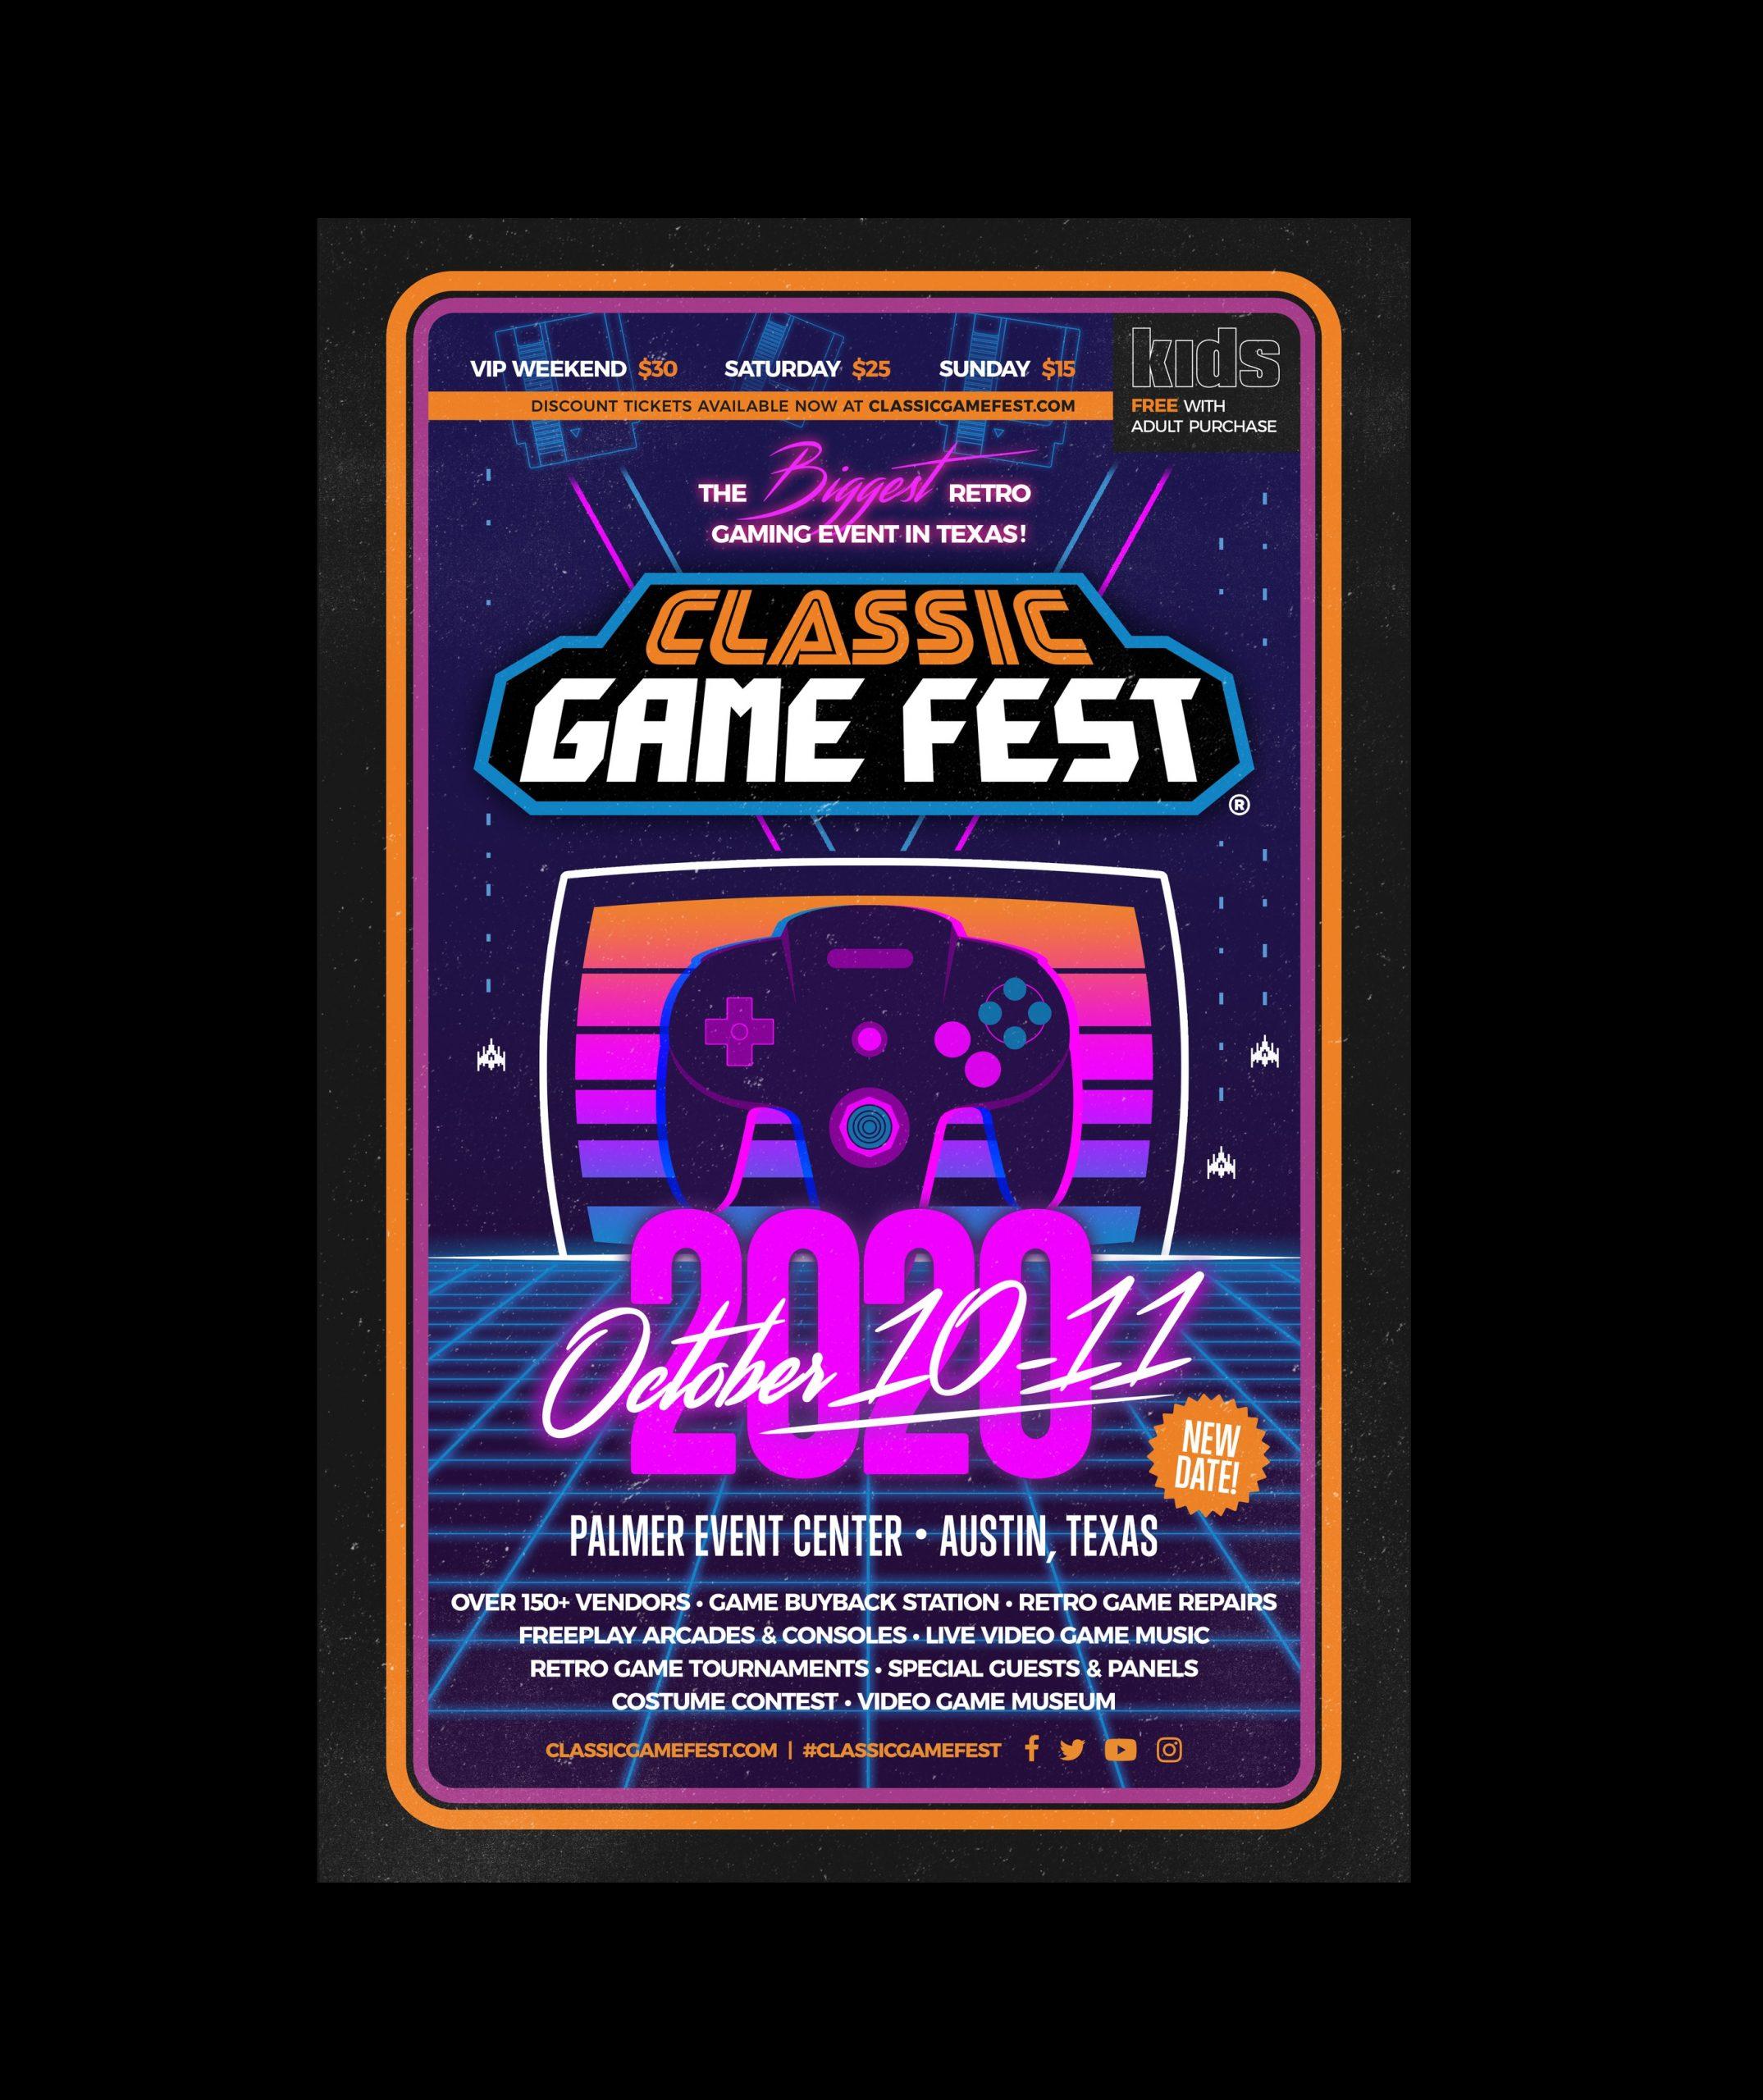 Classic Game Fest Borders